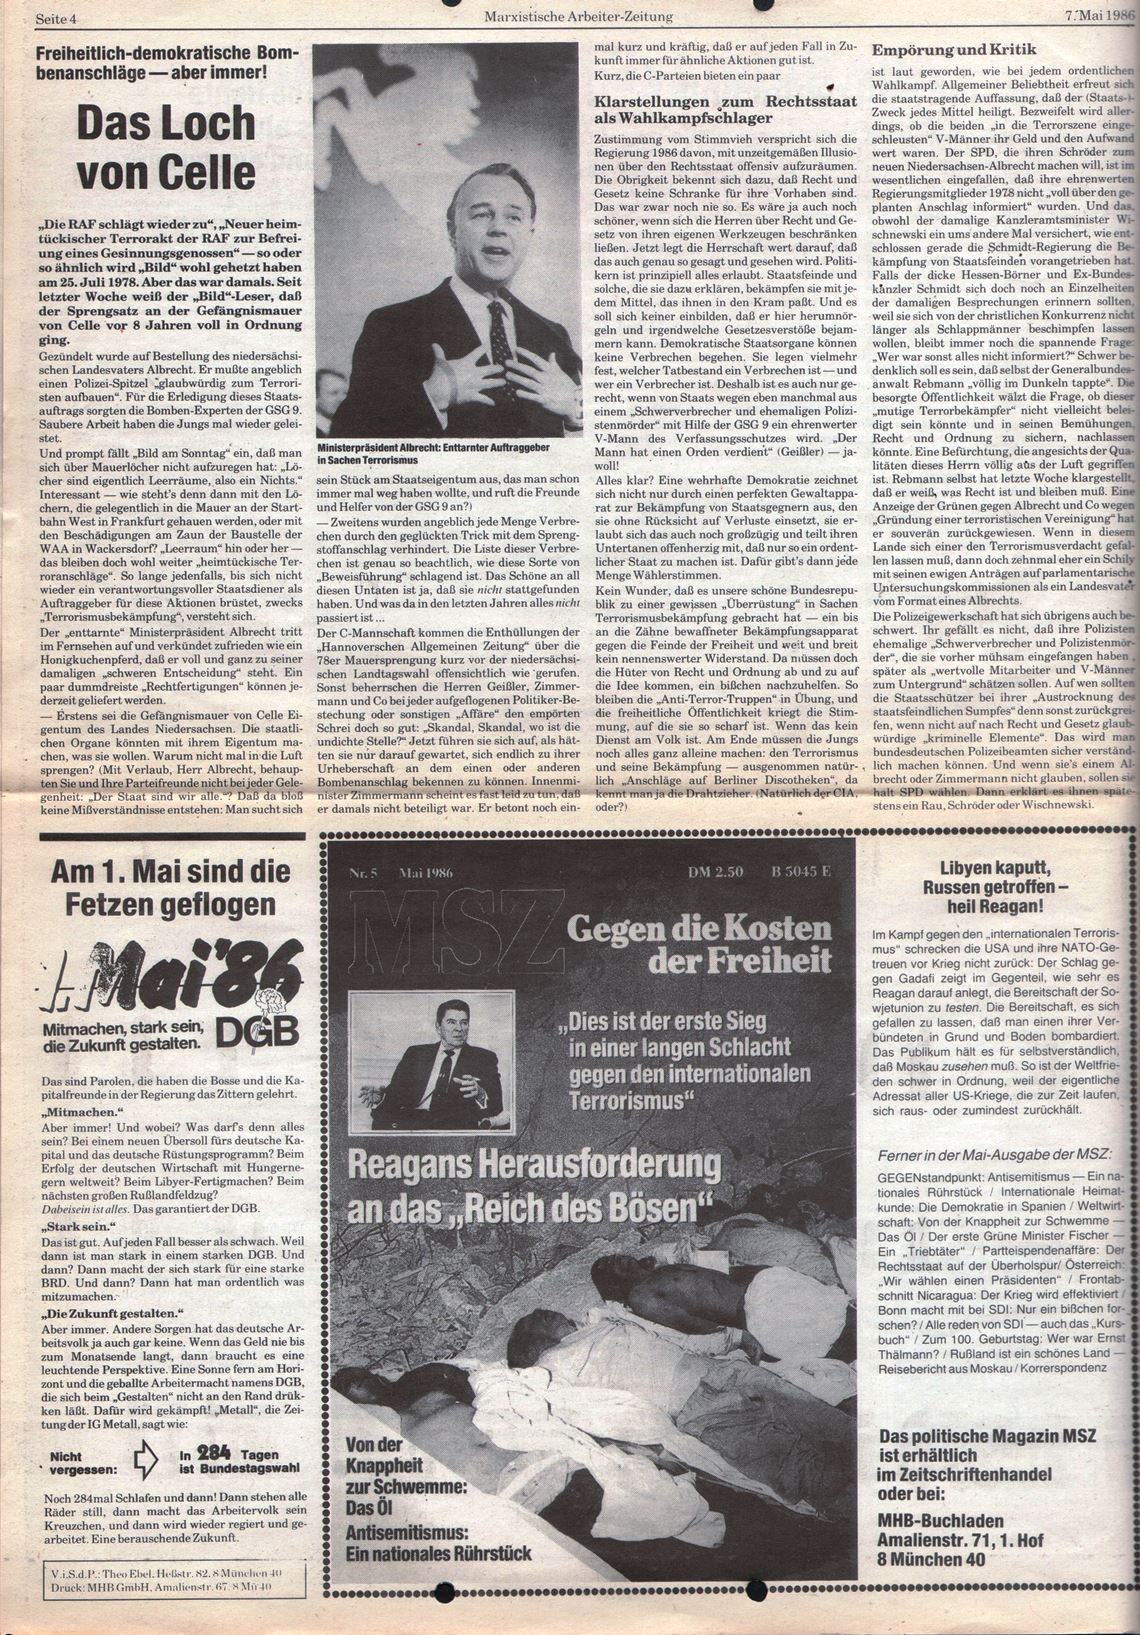 Muenchen_MG_MAZ_Siemens_19860507_04